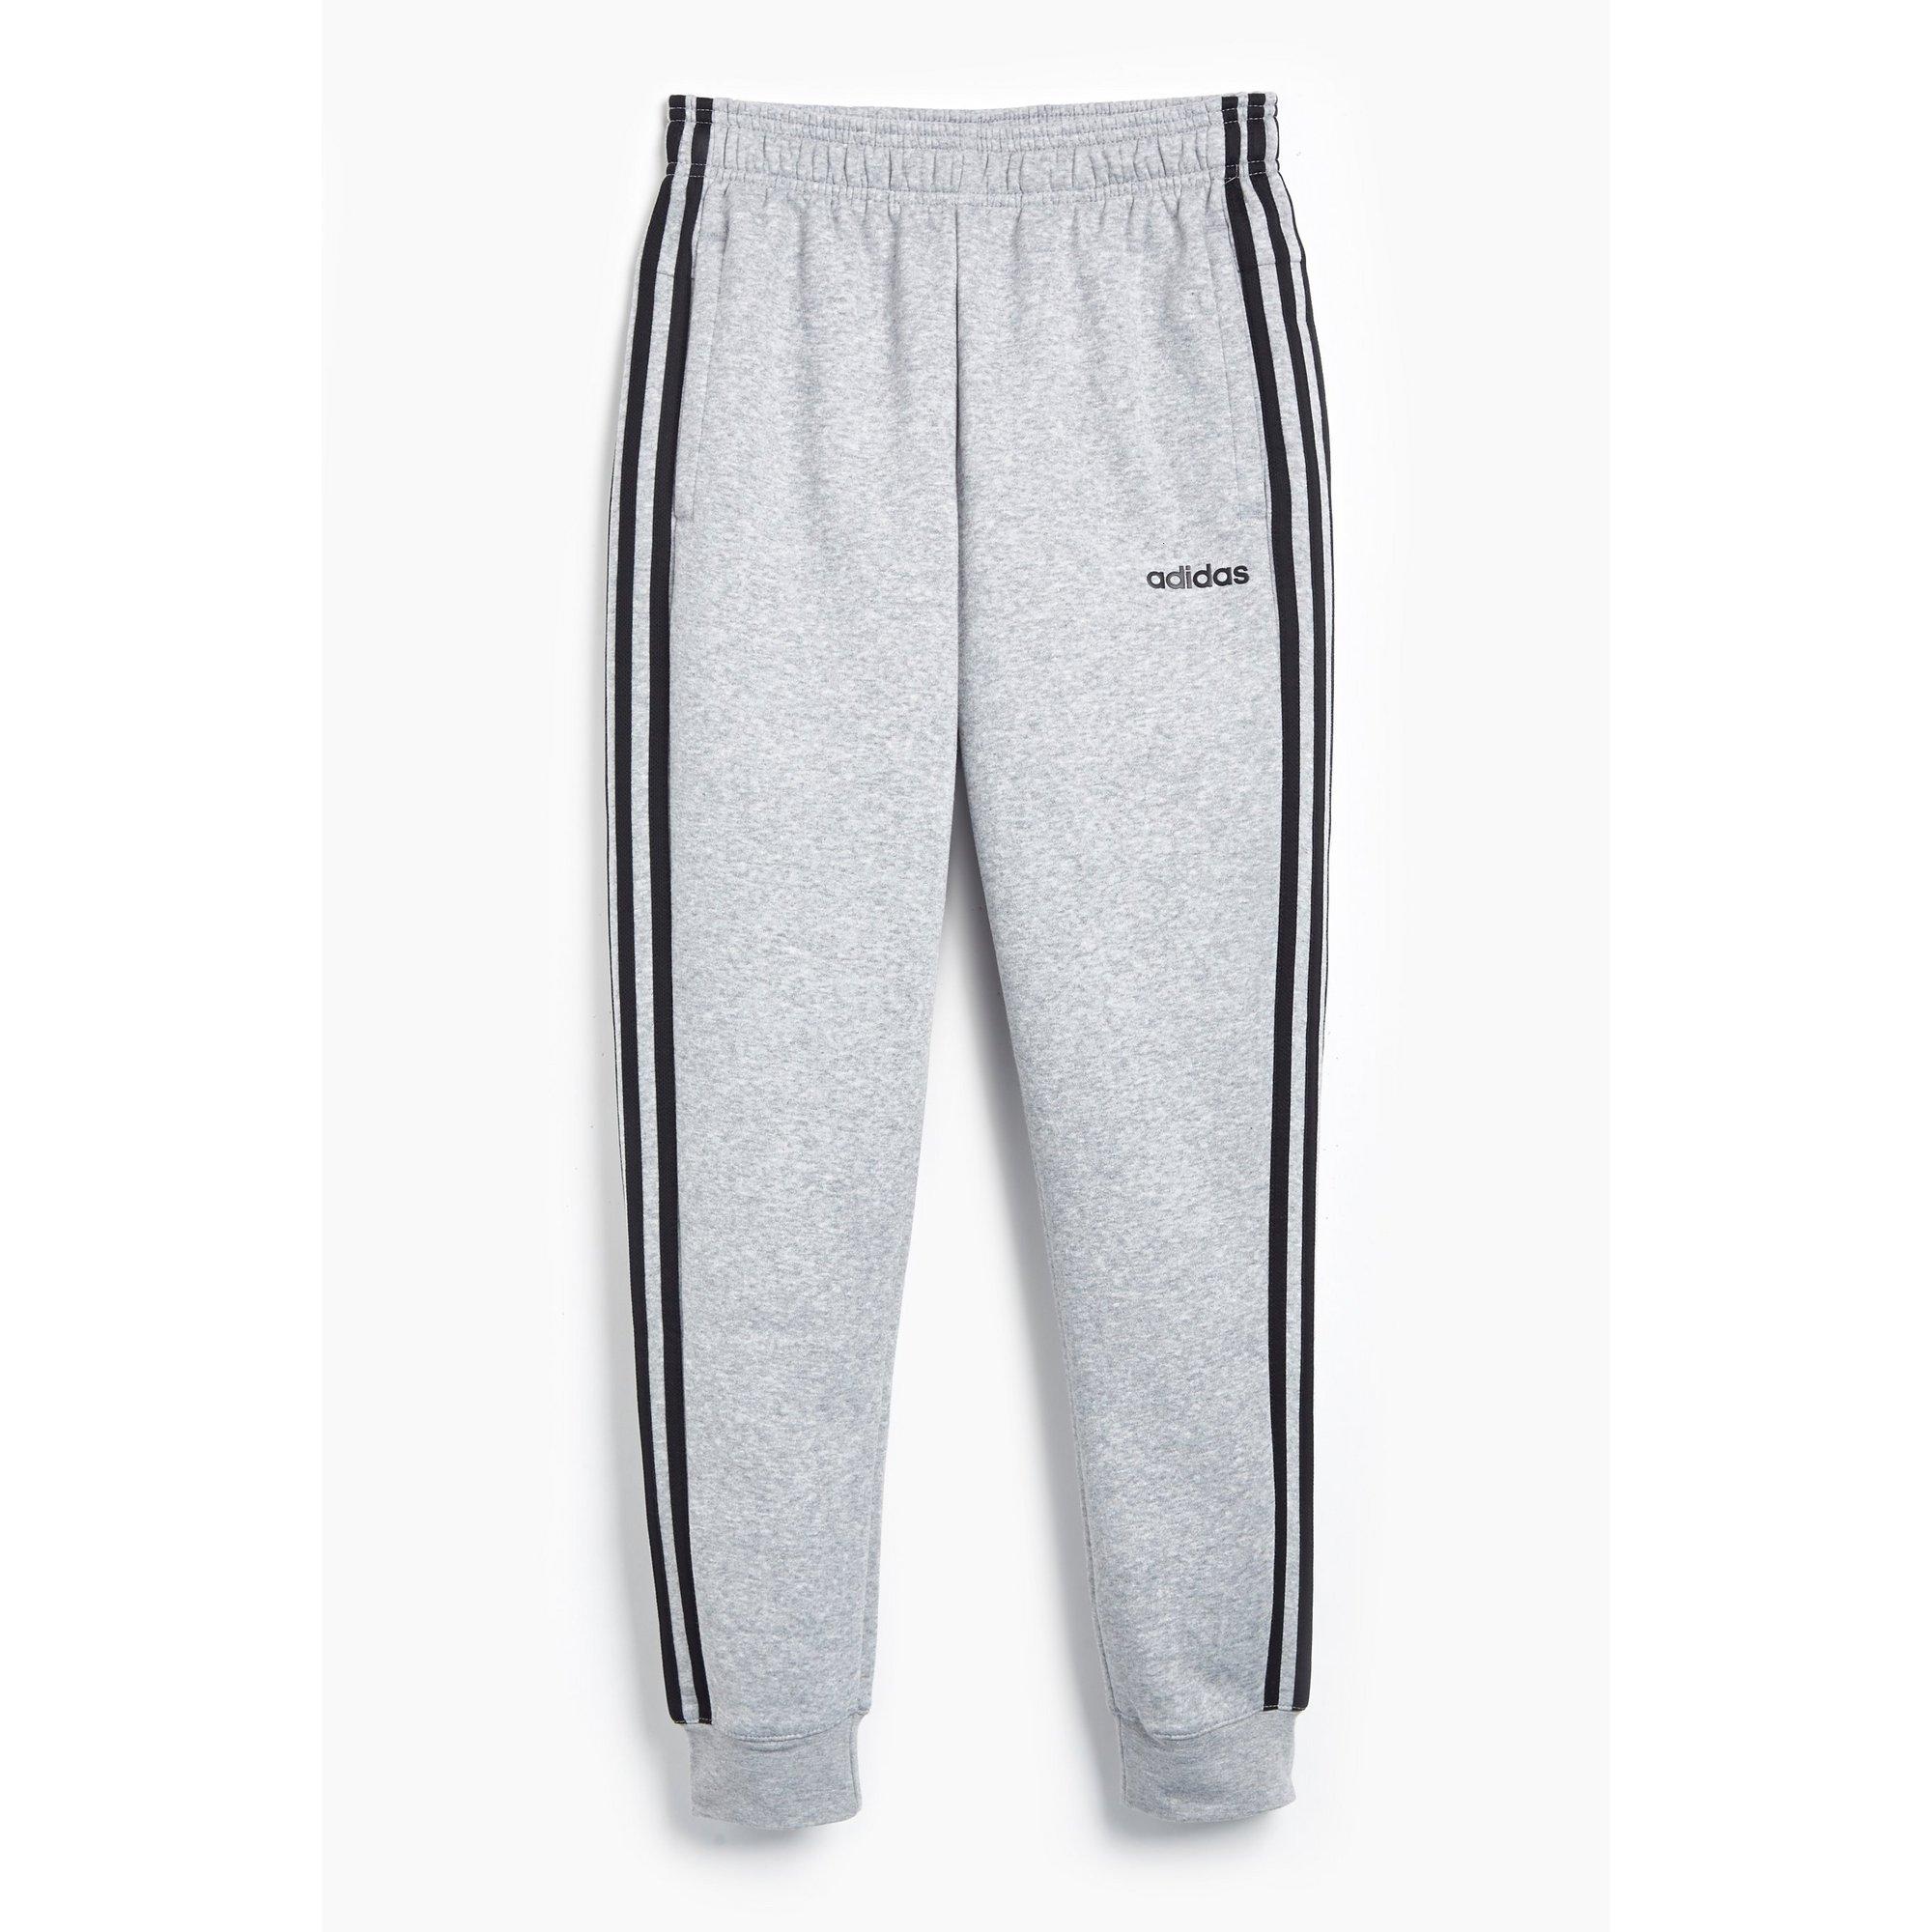 Image of Boys adidas Essentials 3-Stripes Grey Joggers